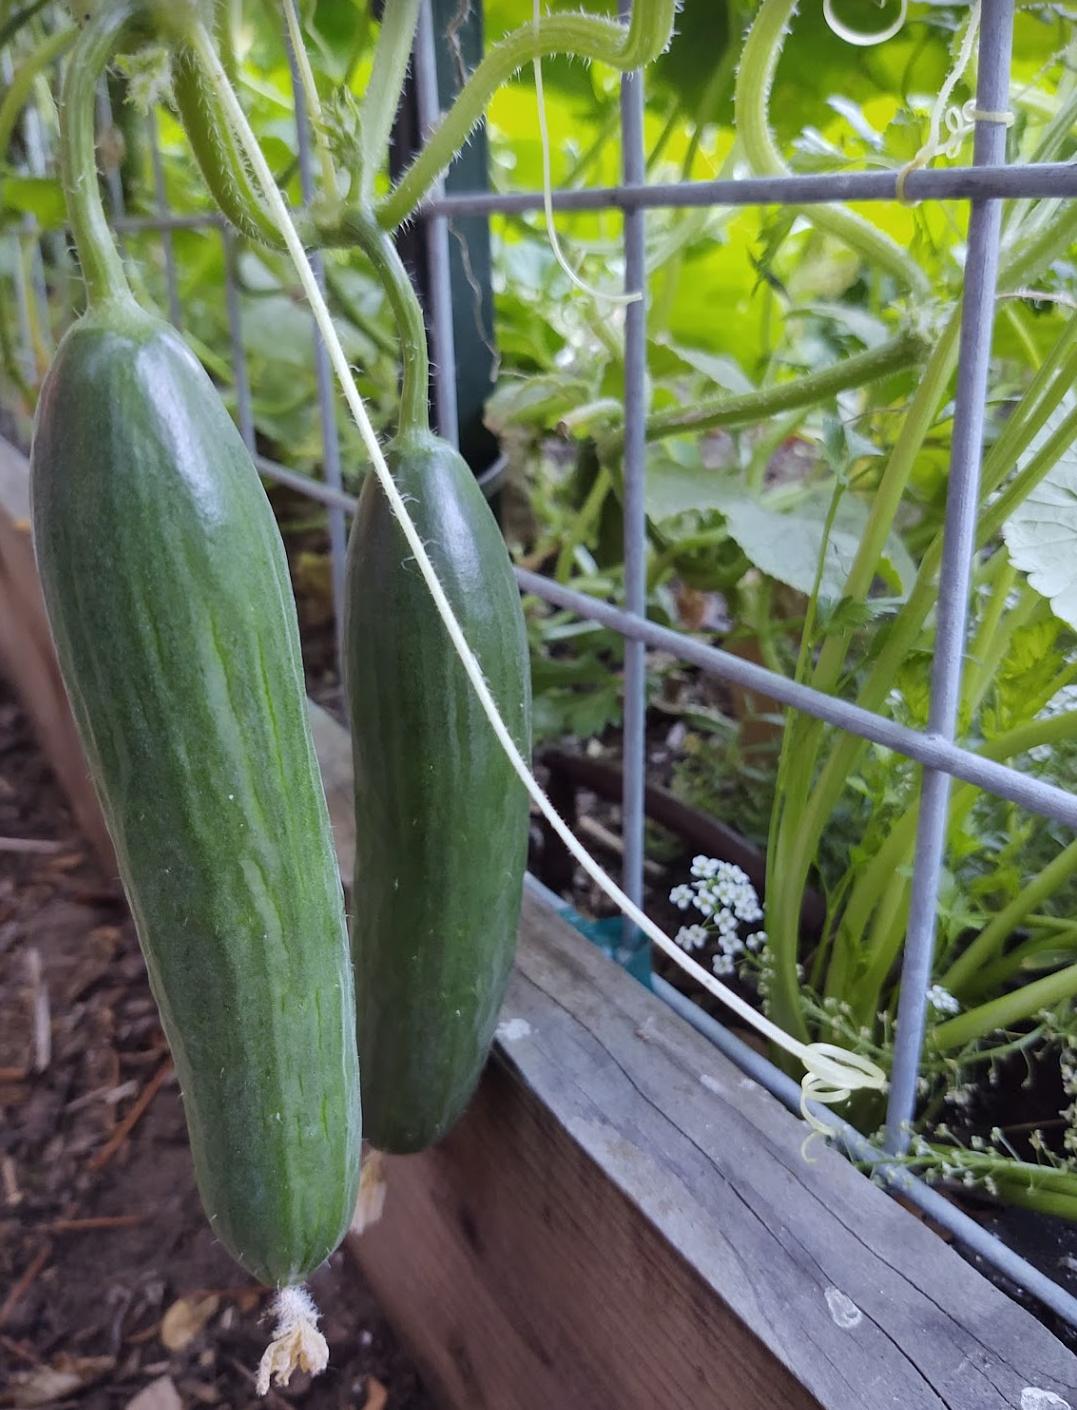 persian cucumbers | photo credit: joy agcongay